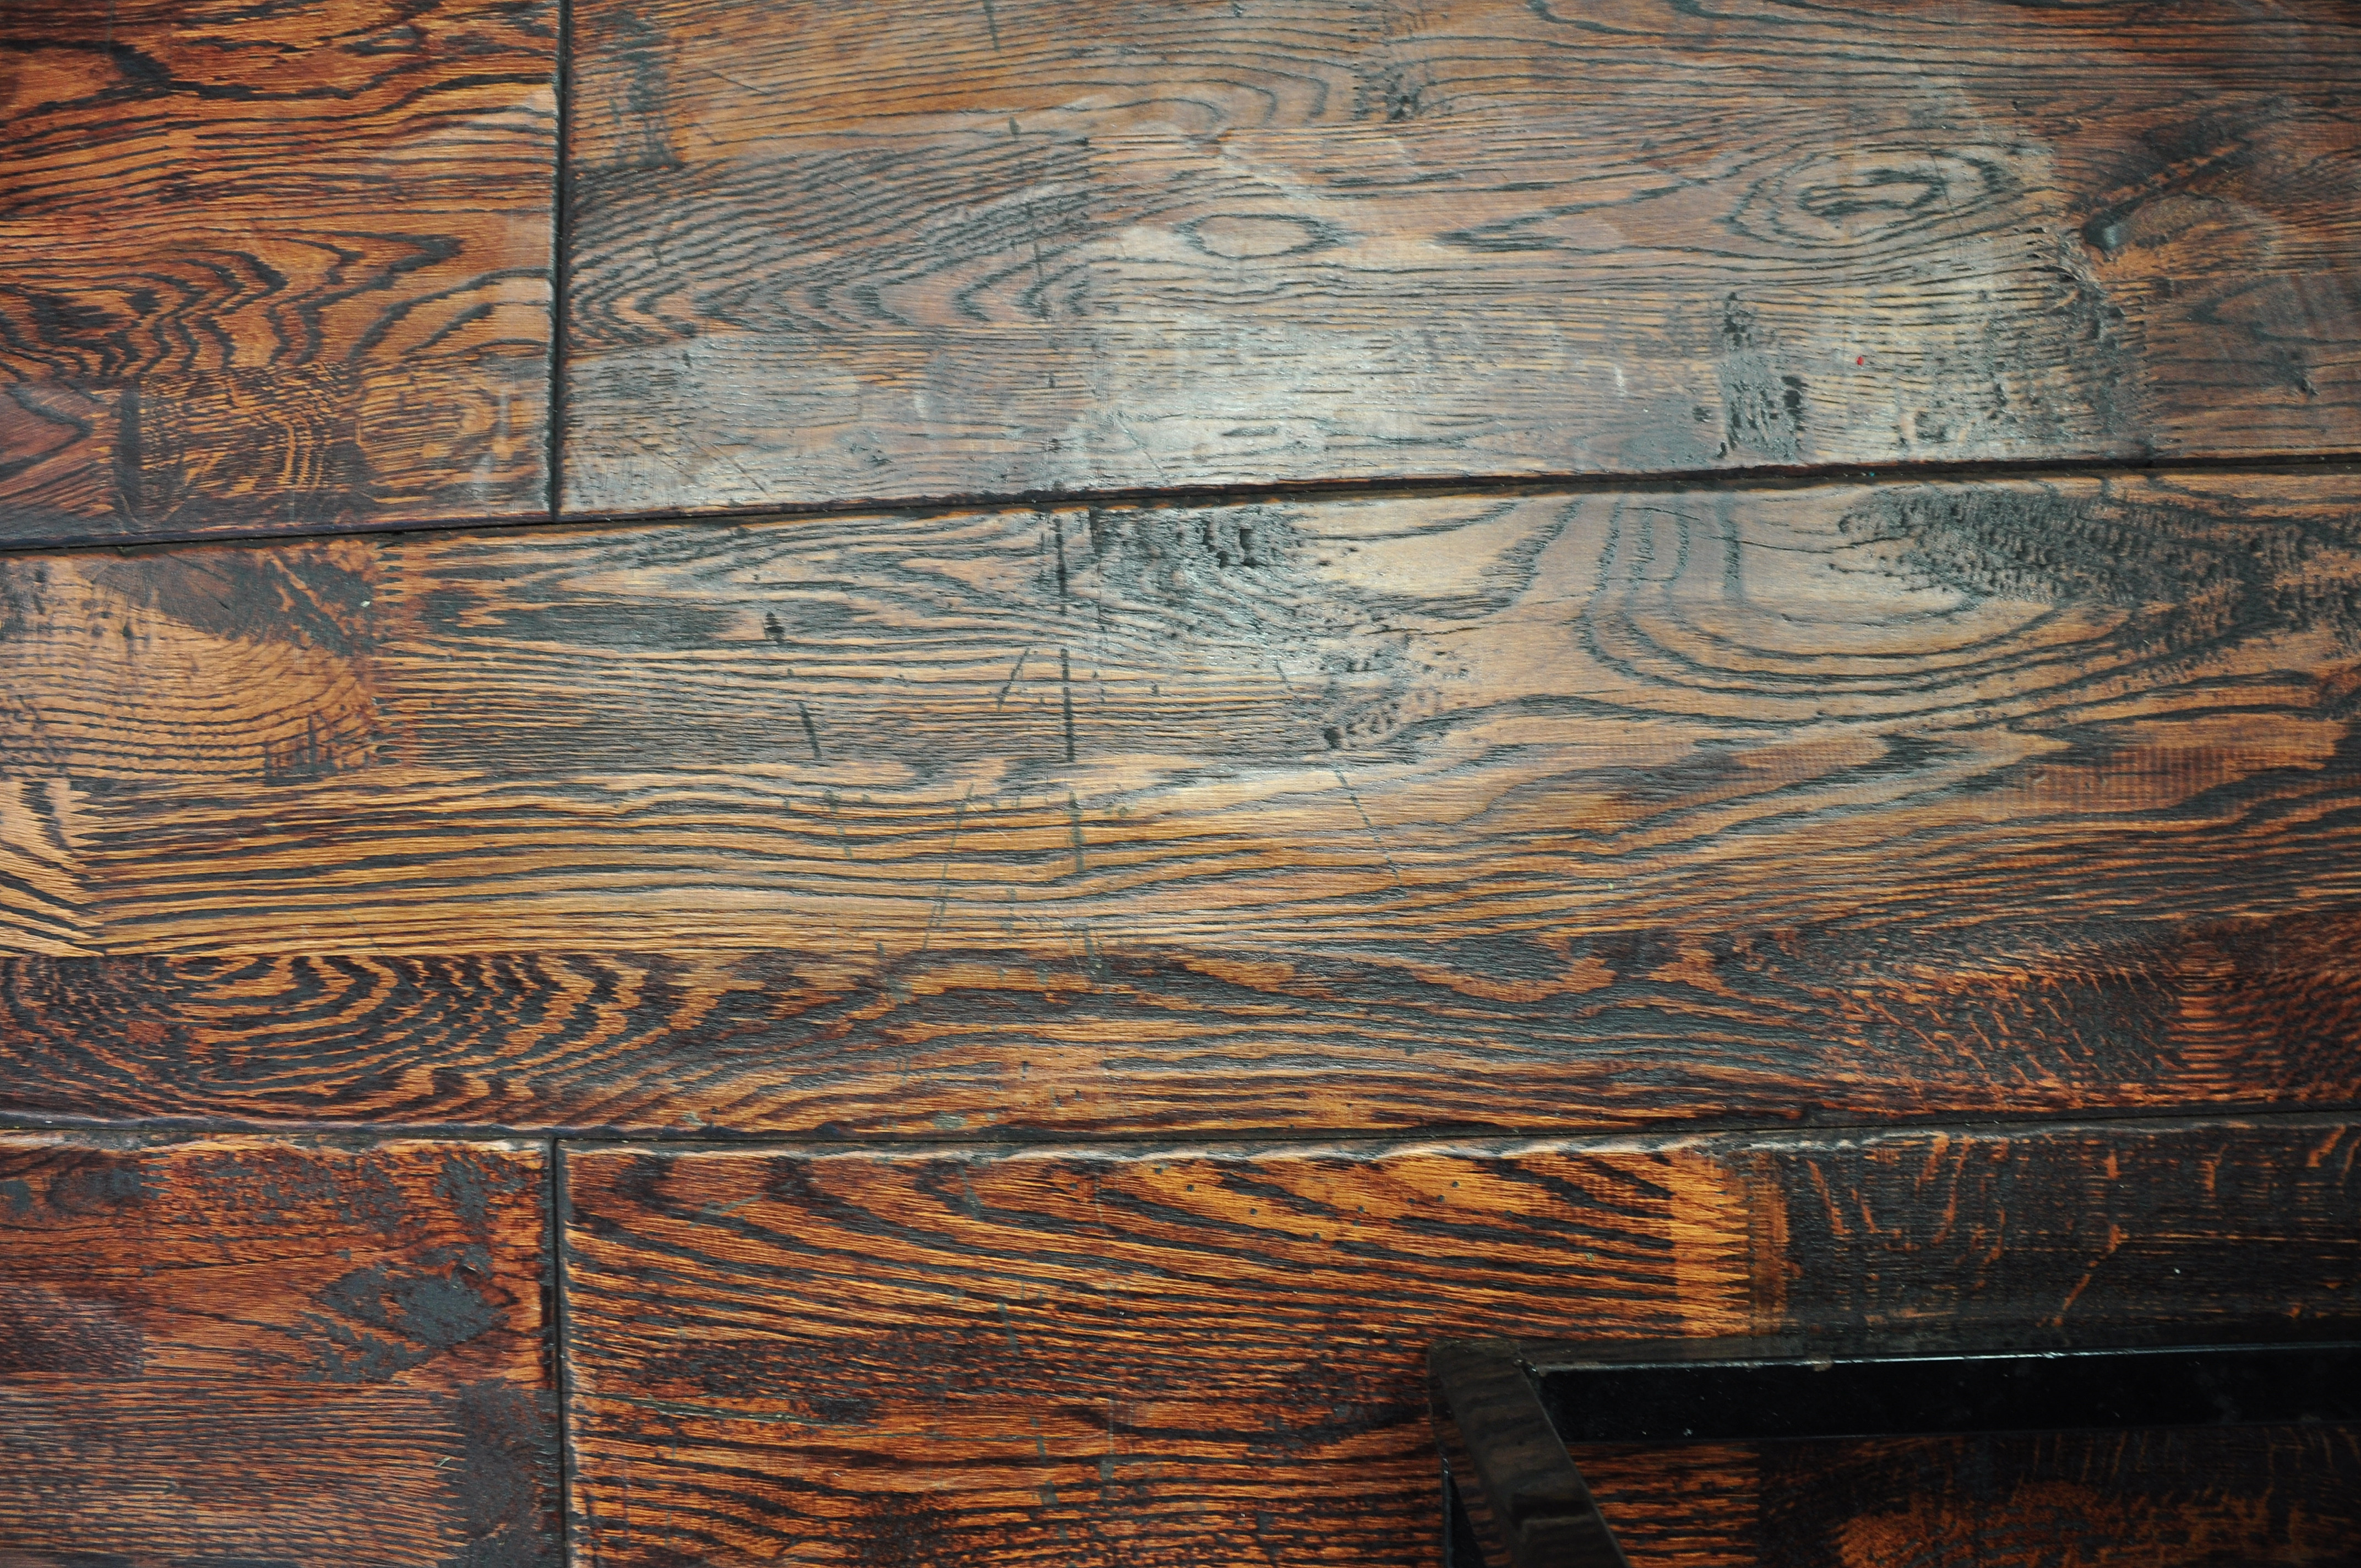 hardwood flooring suppliers near me of best steam mop for wood floors new china steam mop china steam mop in best steam mop for wood floors lovely 11 best od floors pinterest awesome wood floor steam